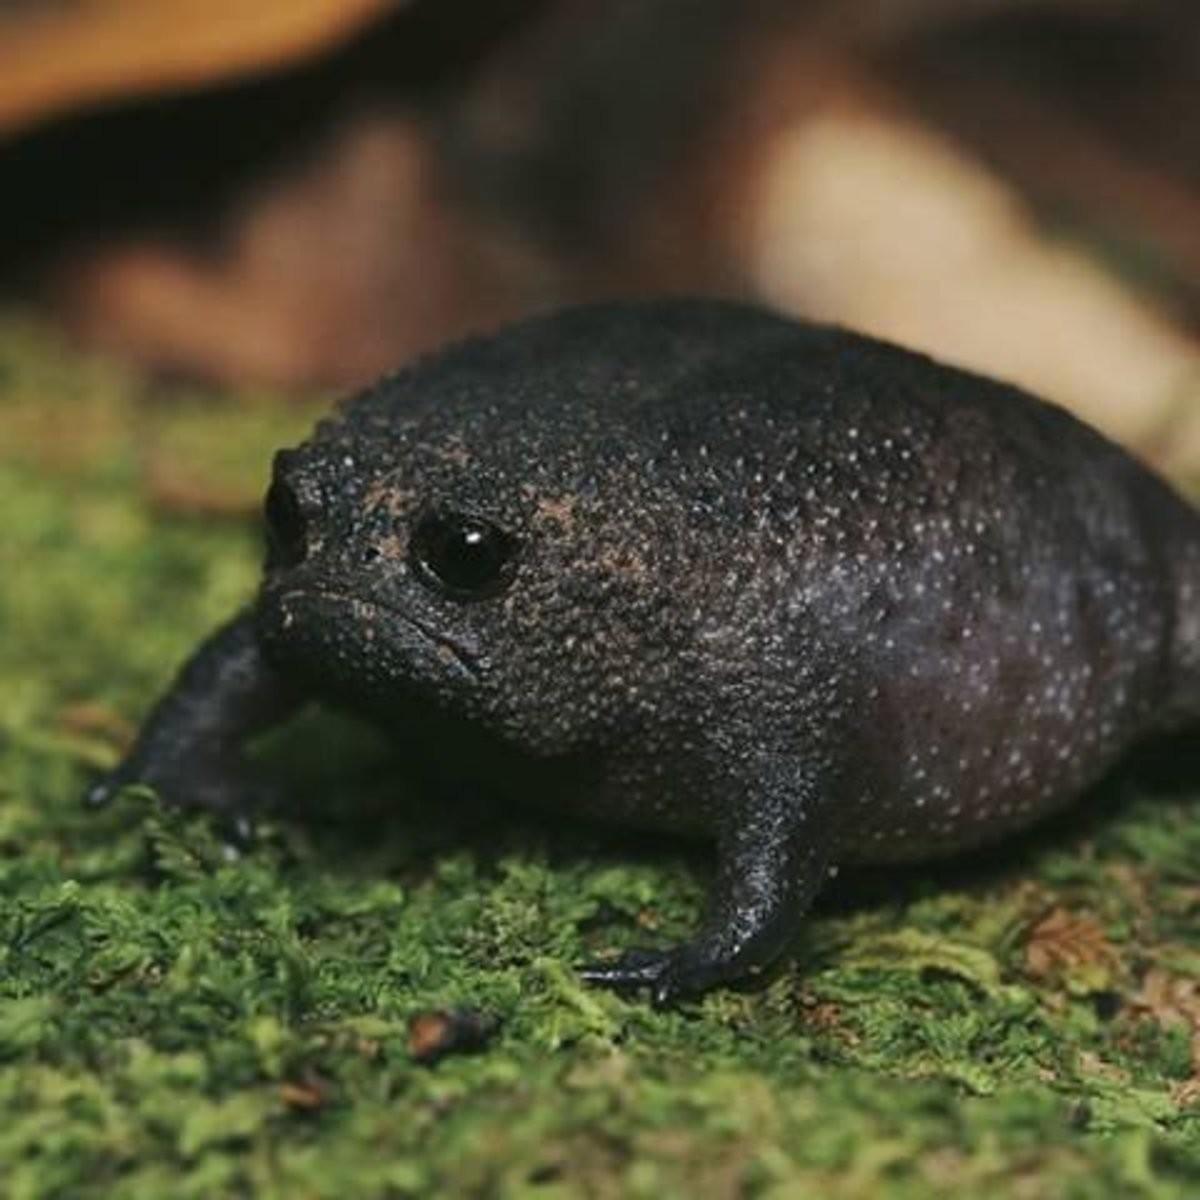 sad froggy. .. Desert rain frog, they look like mold and sound like deflating balloons .